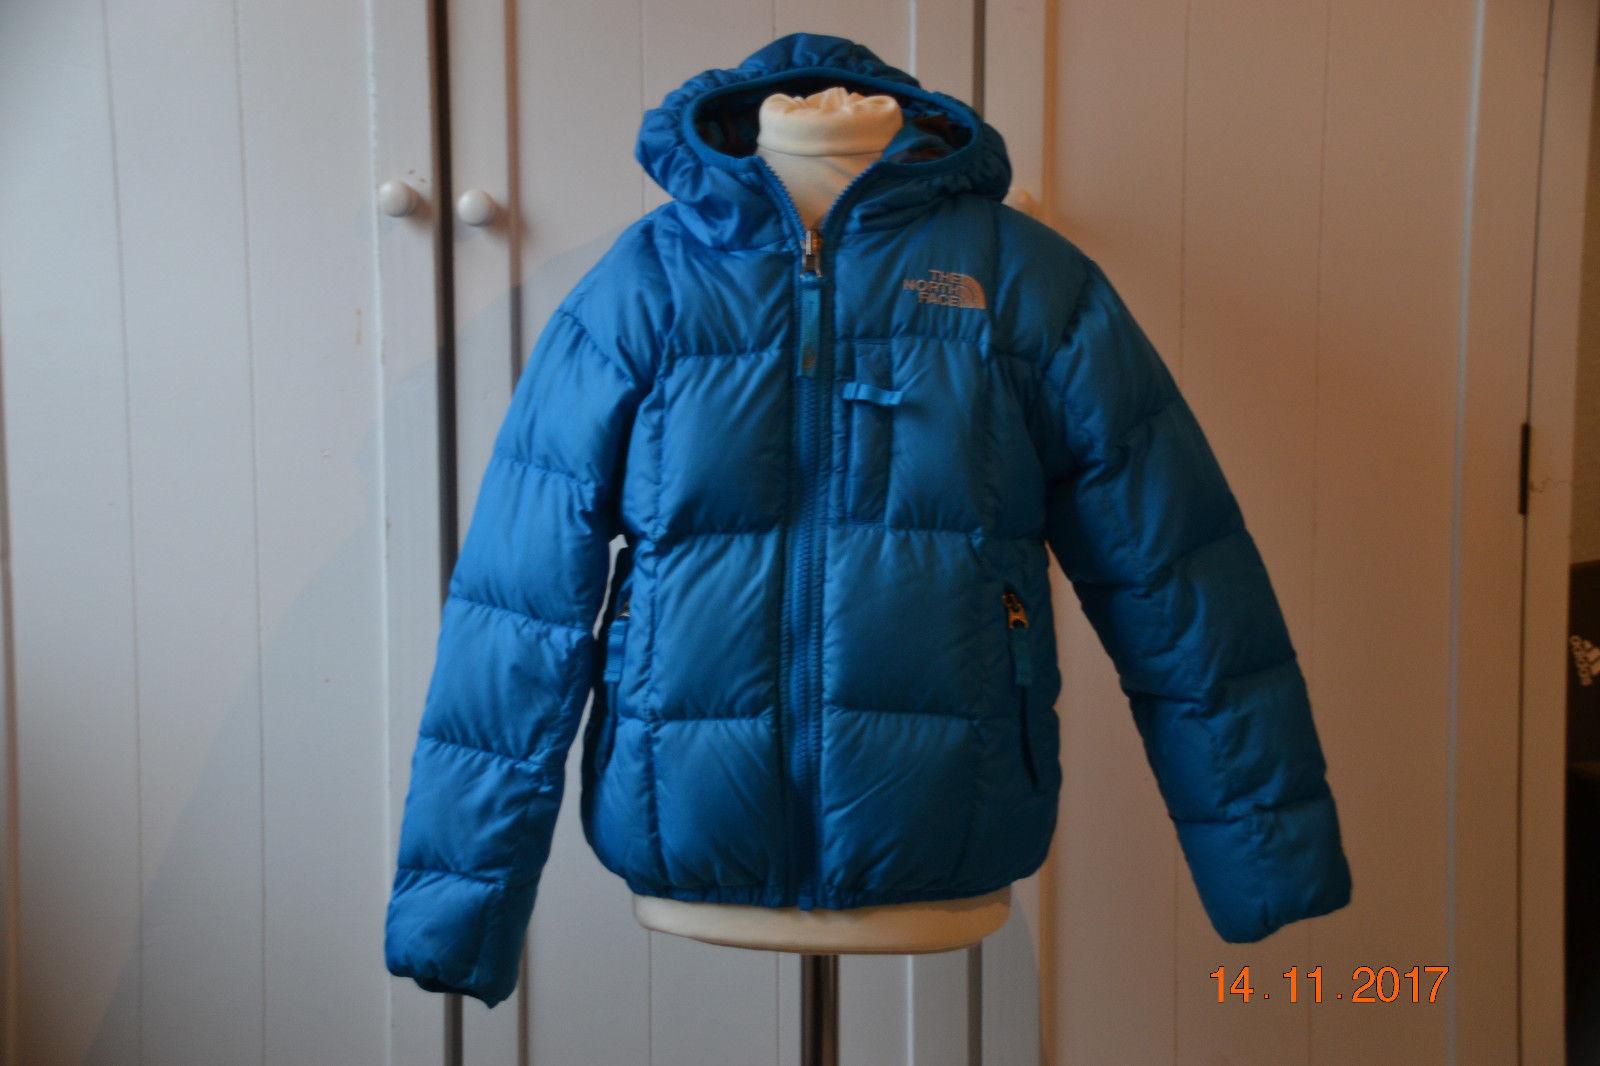 online retailer d1cc3 bf89f The North Face Daunenjacke Winterjacke blau Gr. 116 Mädchen Jungen TOP